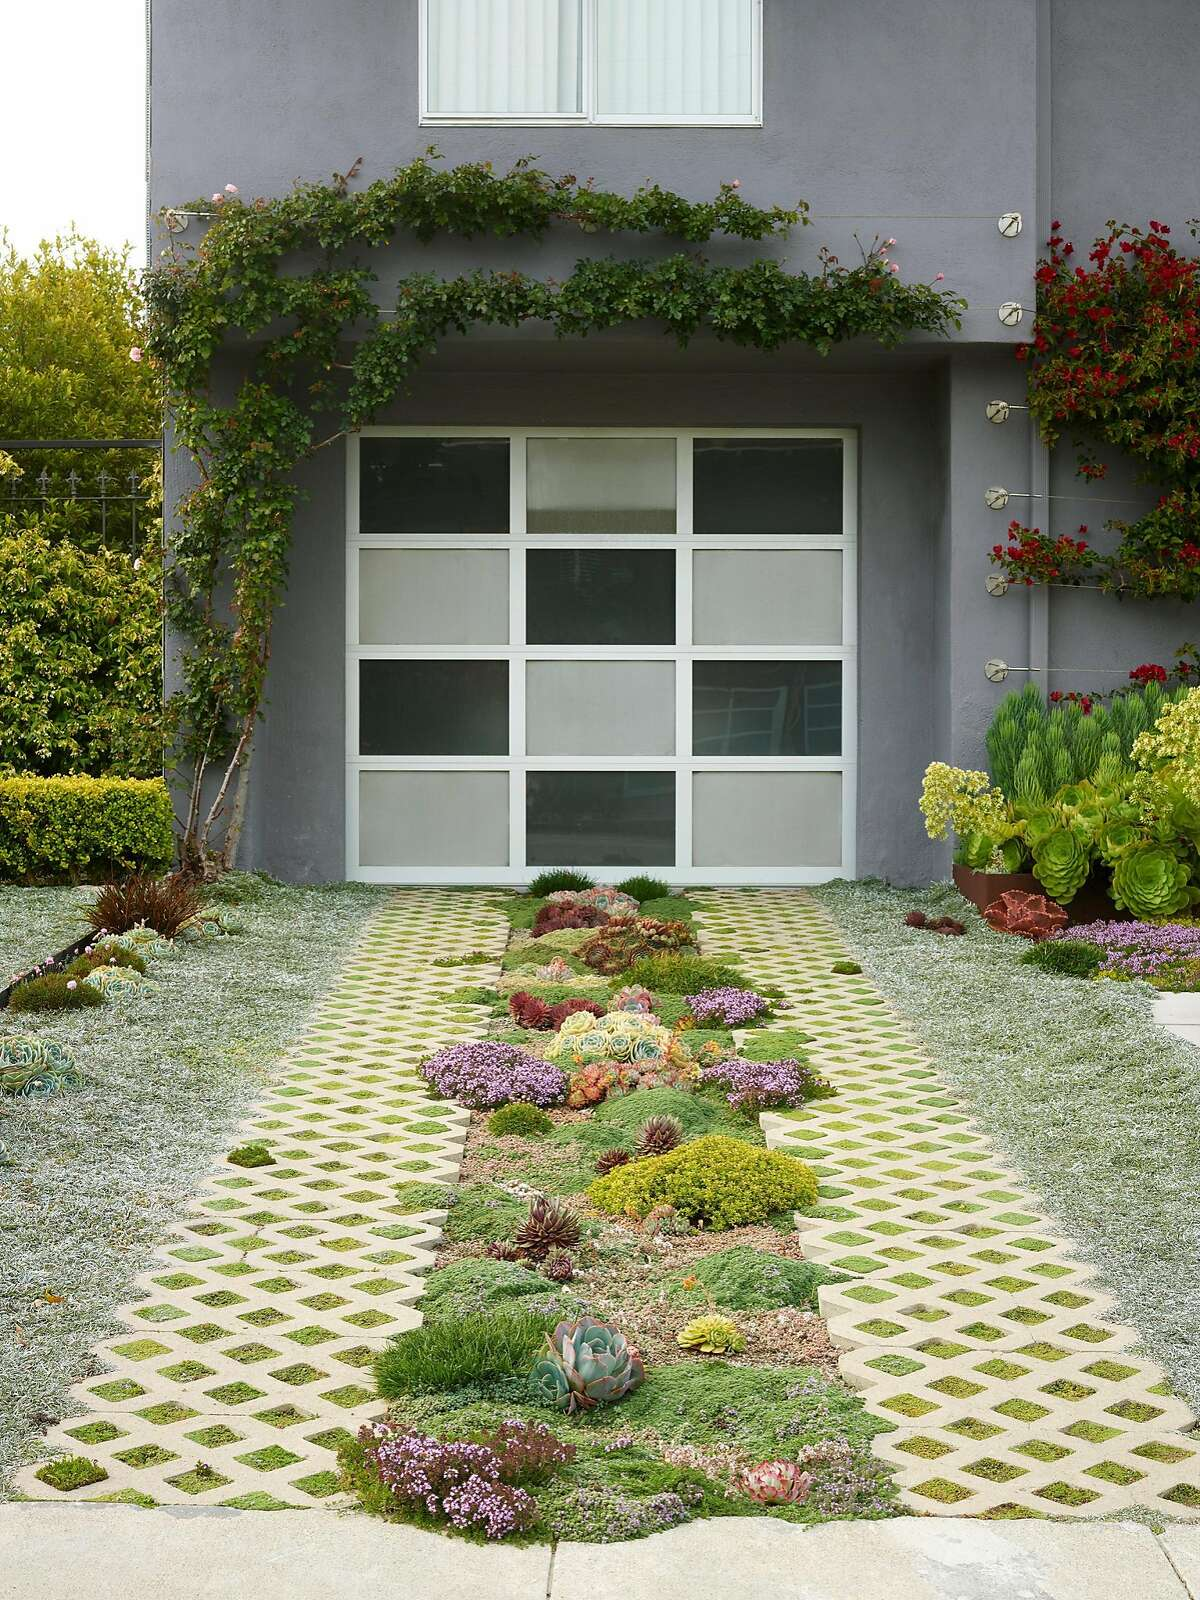 The Nash garden in S.F.